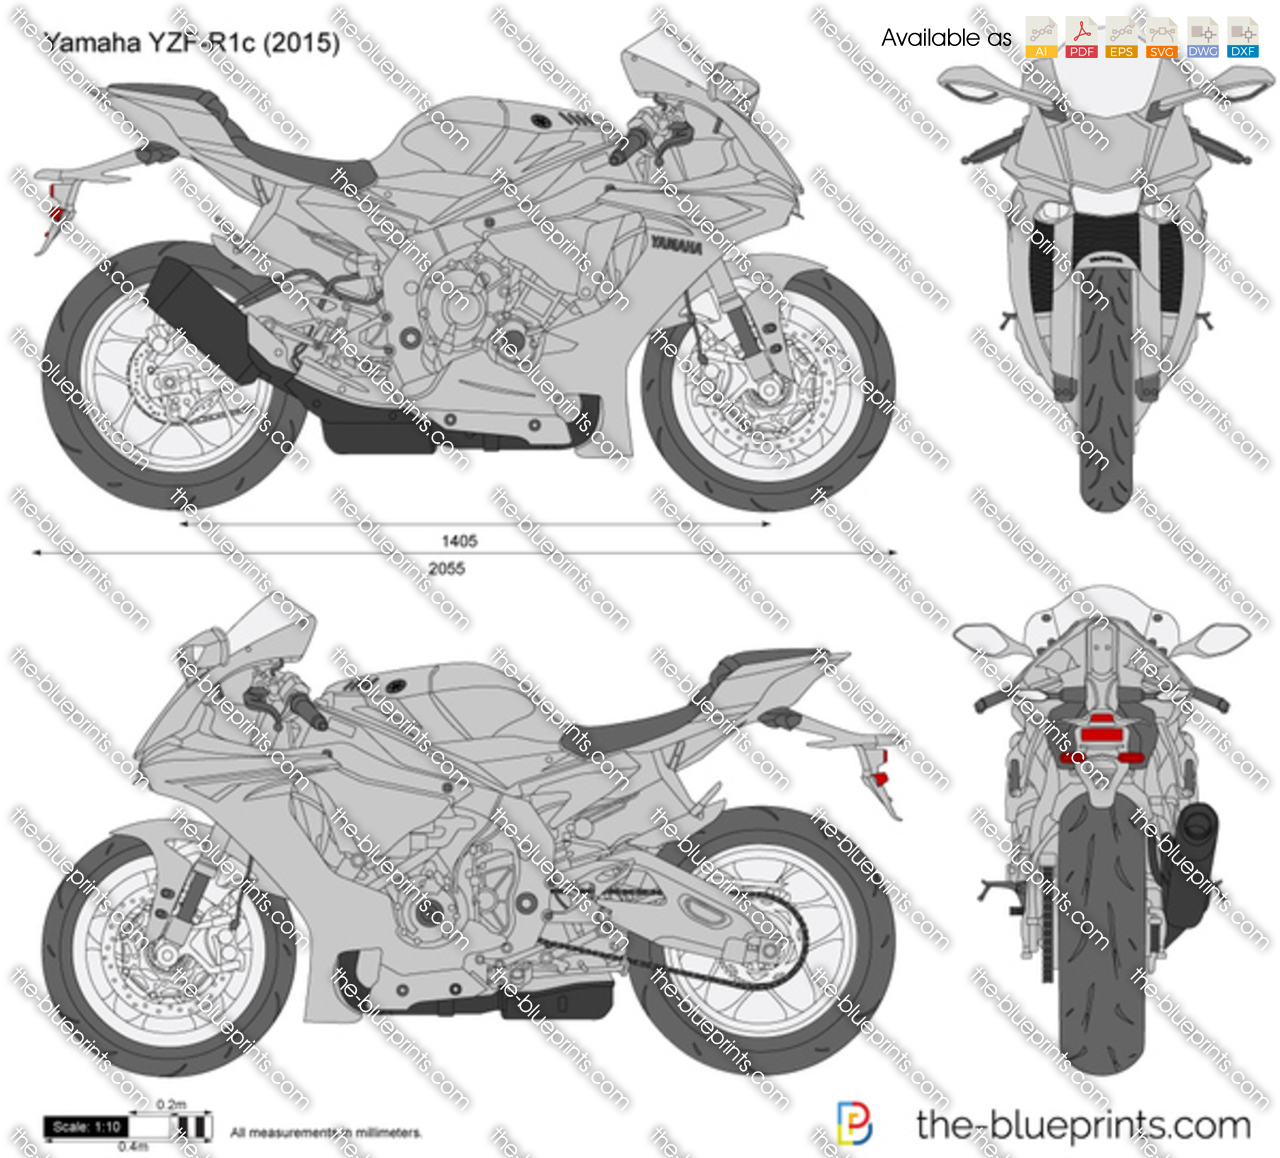 Motorrad Bilder Detail Moto Guzzi V50 Ellaspede 10684 in addition Ti Etoimazei H Kawasaki 108195 additionally Category further Motorcycle Acceleration Data likewise Category. on mv agusta touring